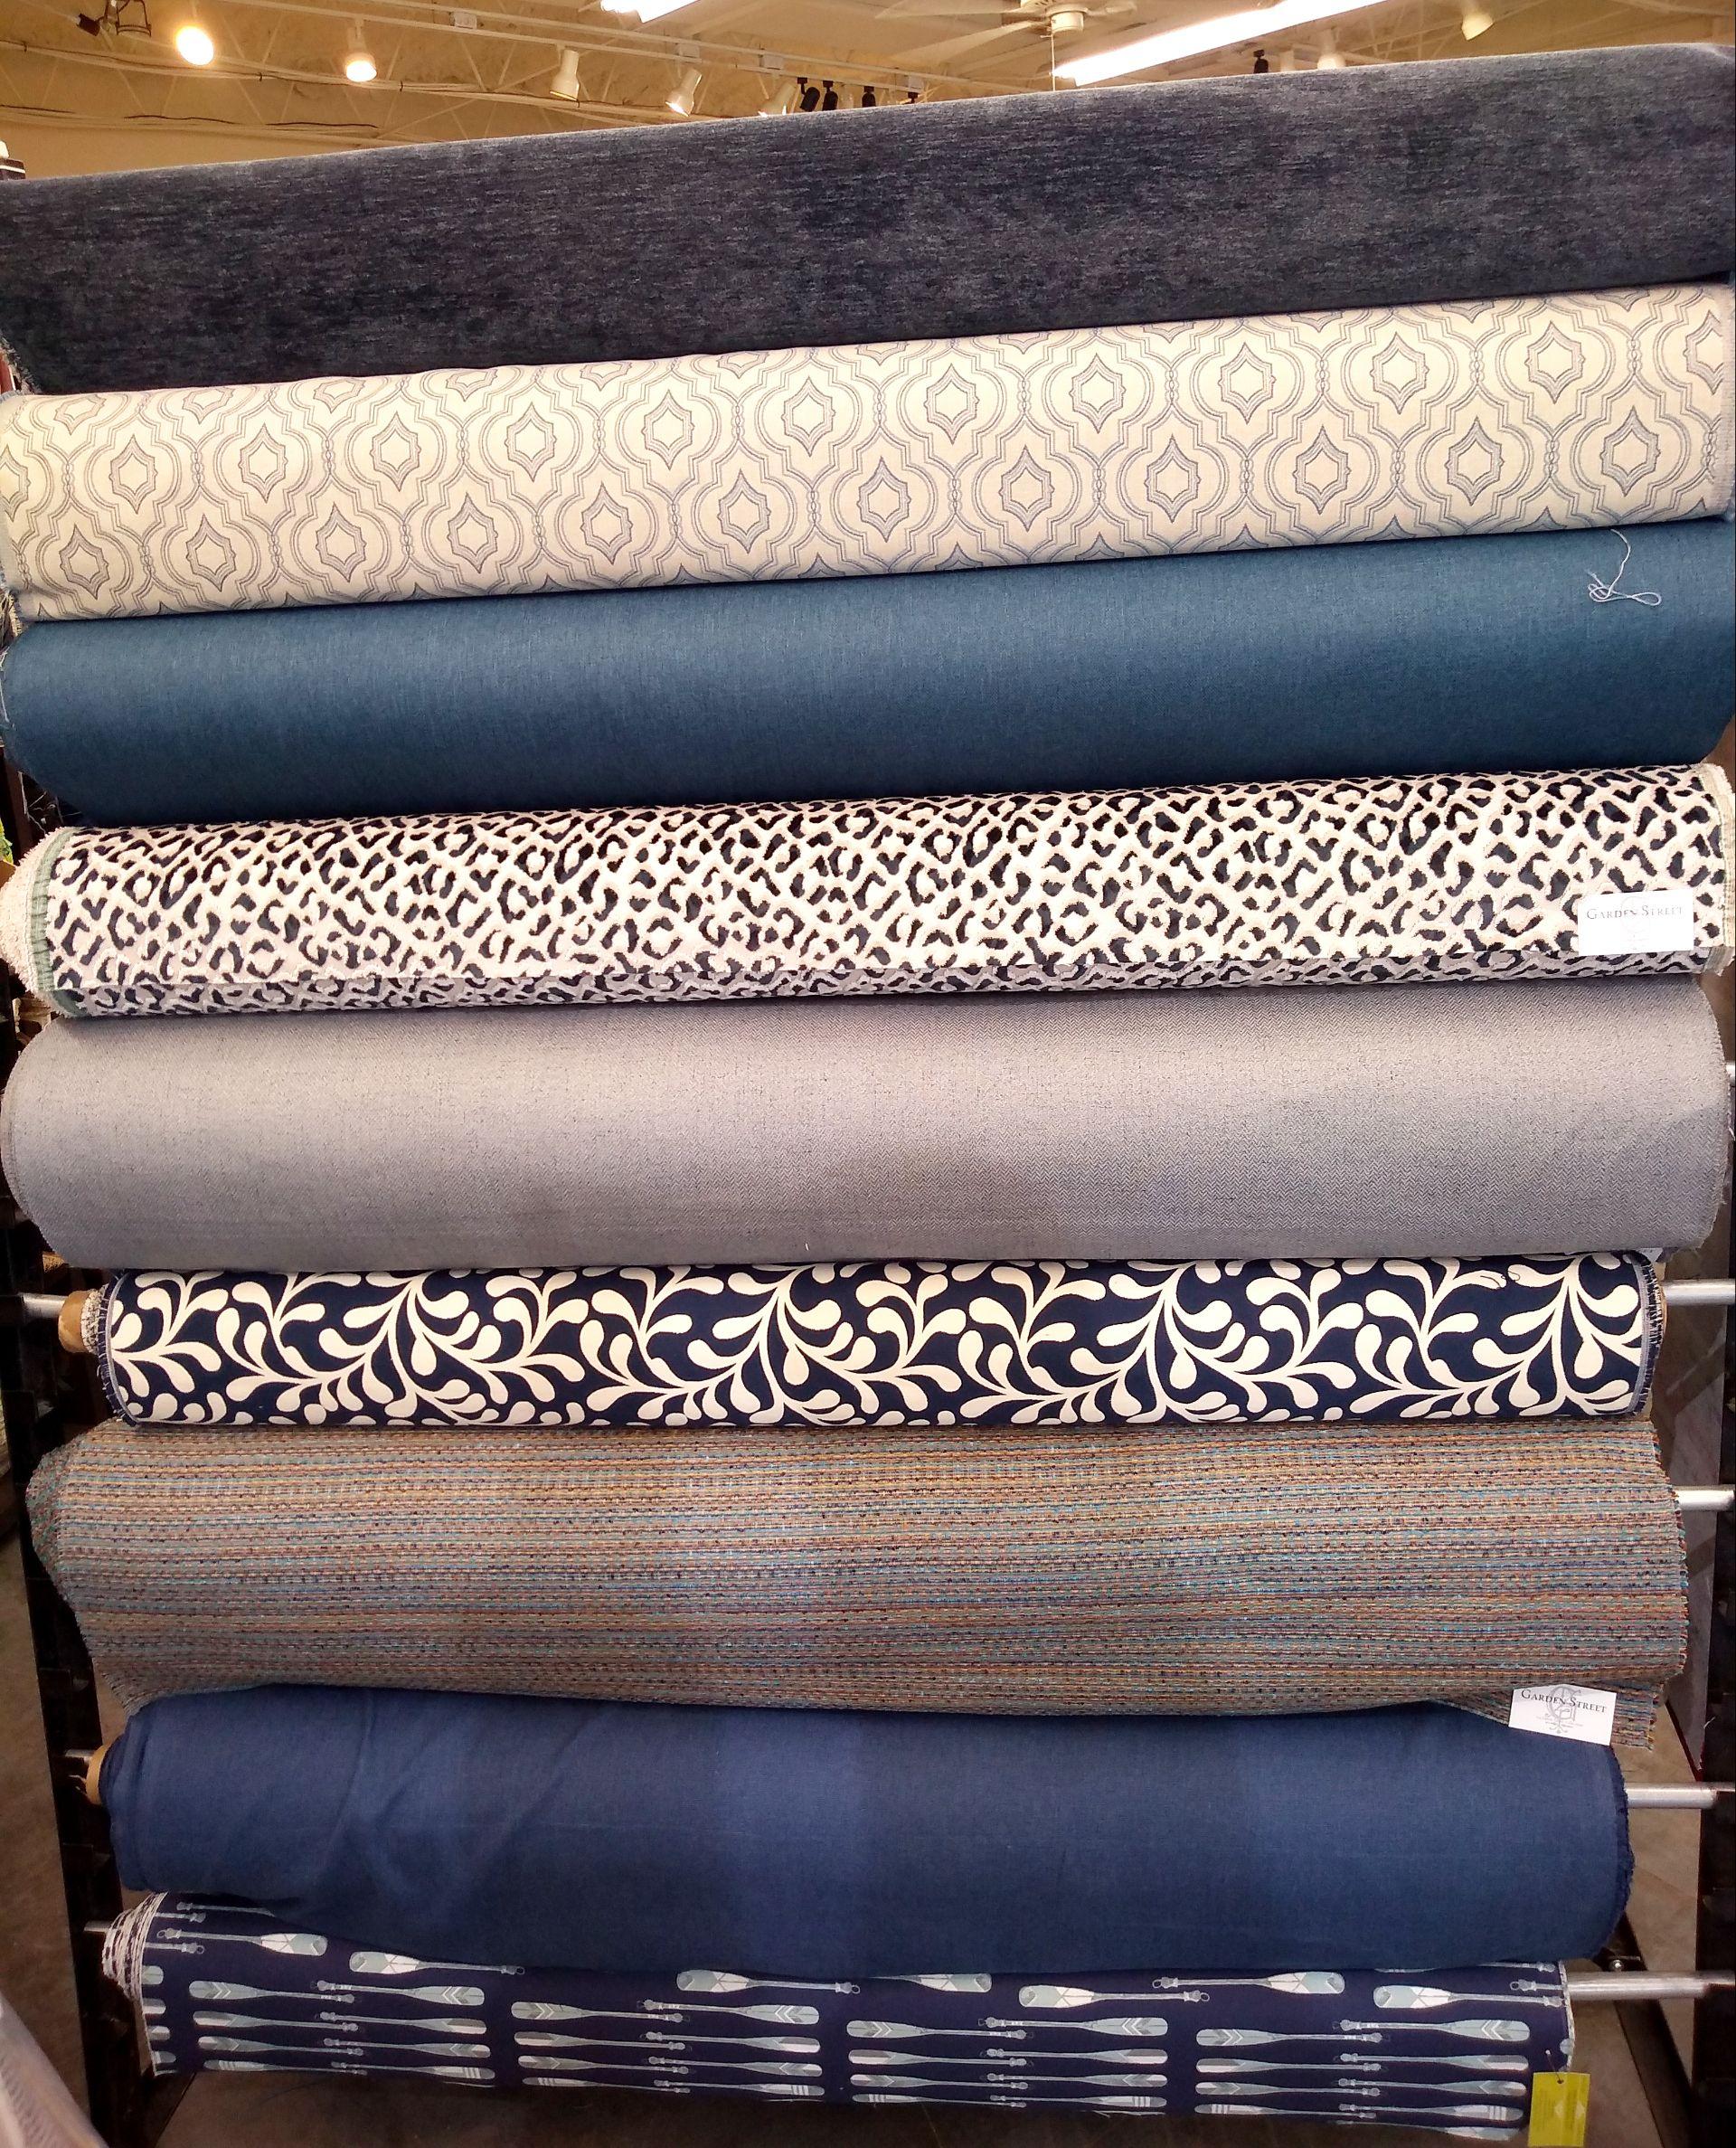 New Arrivals In Stock Fabric Store Interior Fabric Fabric